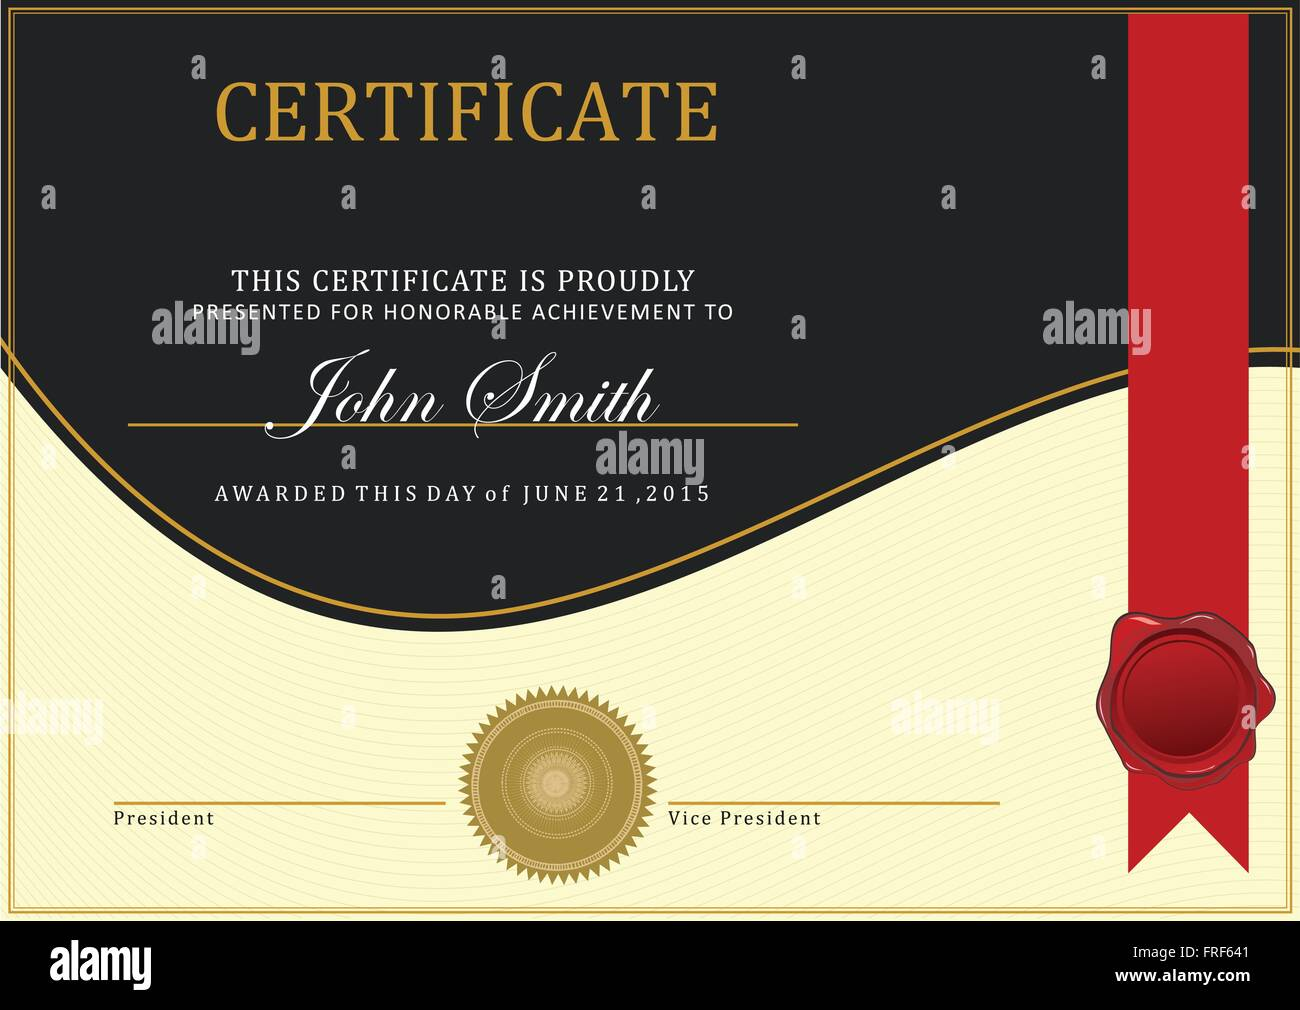 Stock Certificate Ribbon Stockfotos & Stock Certificate Ribbon ...